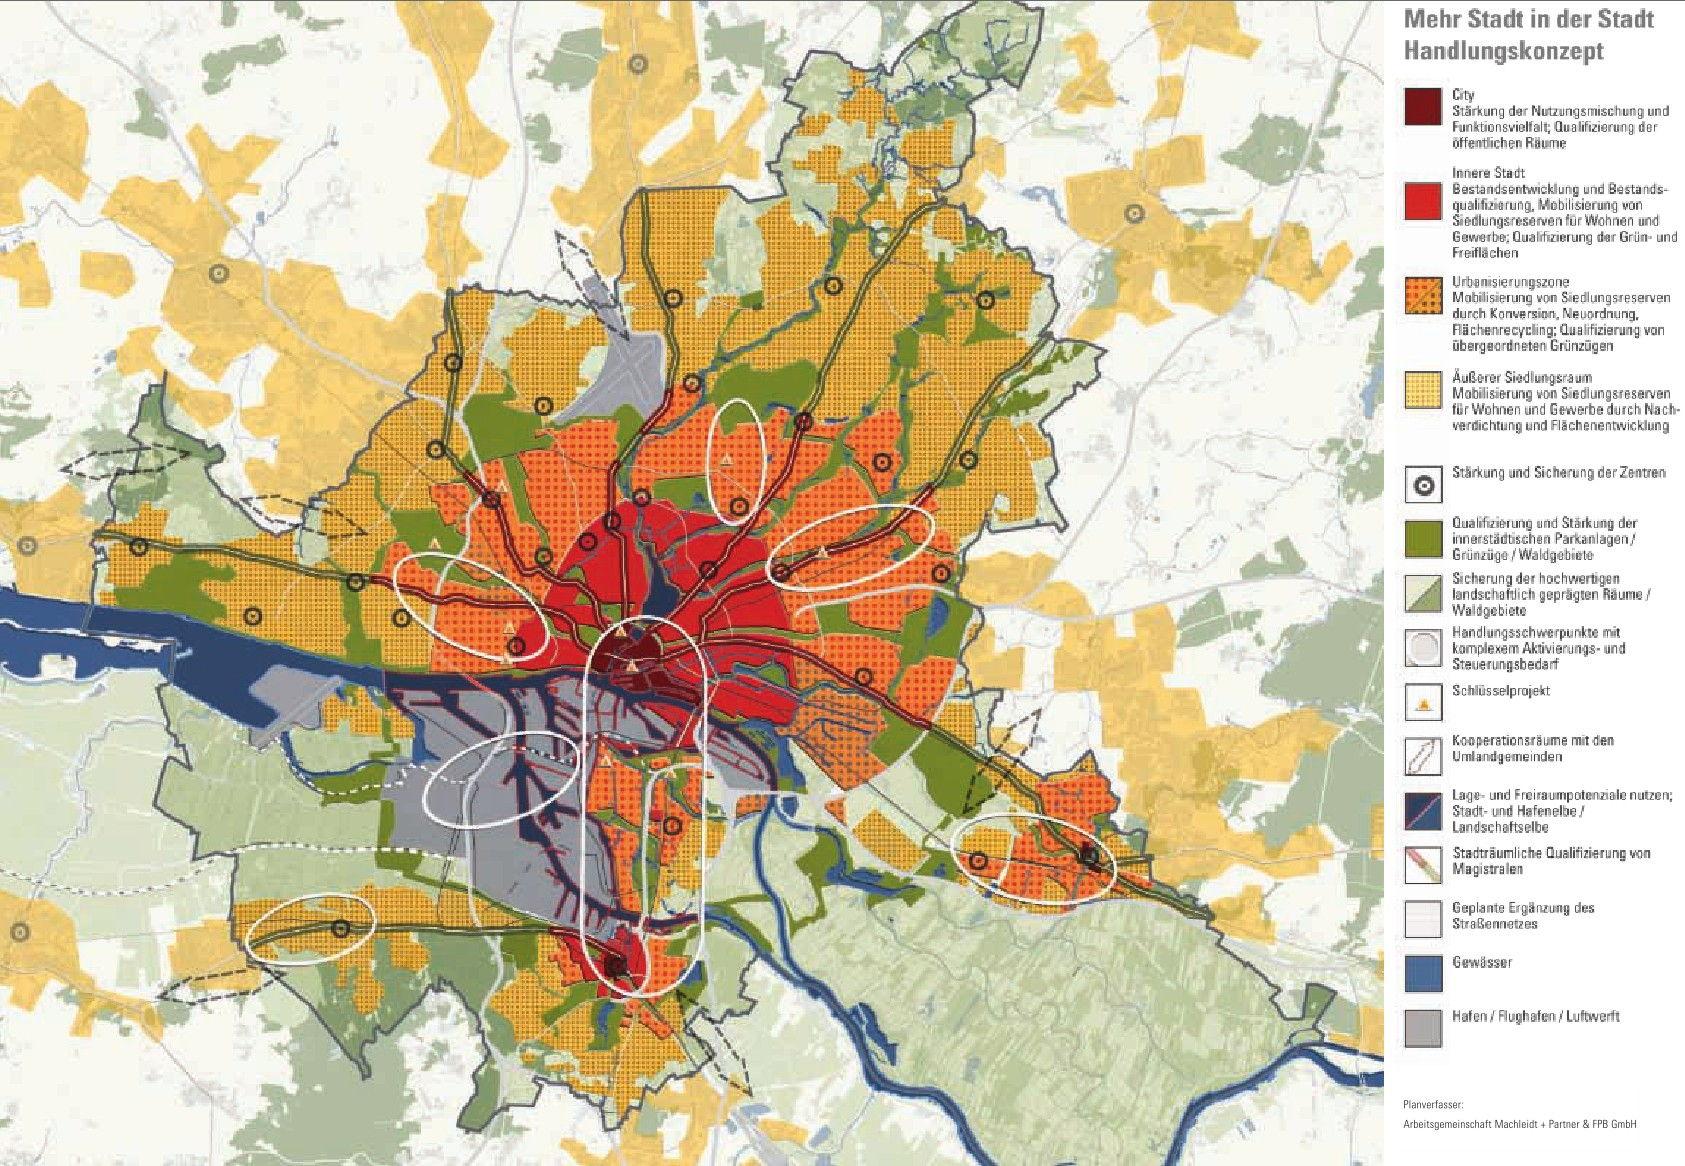 Leitbild Hamburg Raumstruktur Achsenmodell Freiräume Stadtentwicklung Stadtplanung